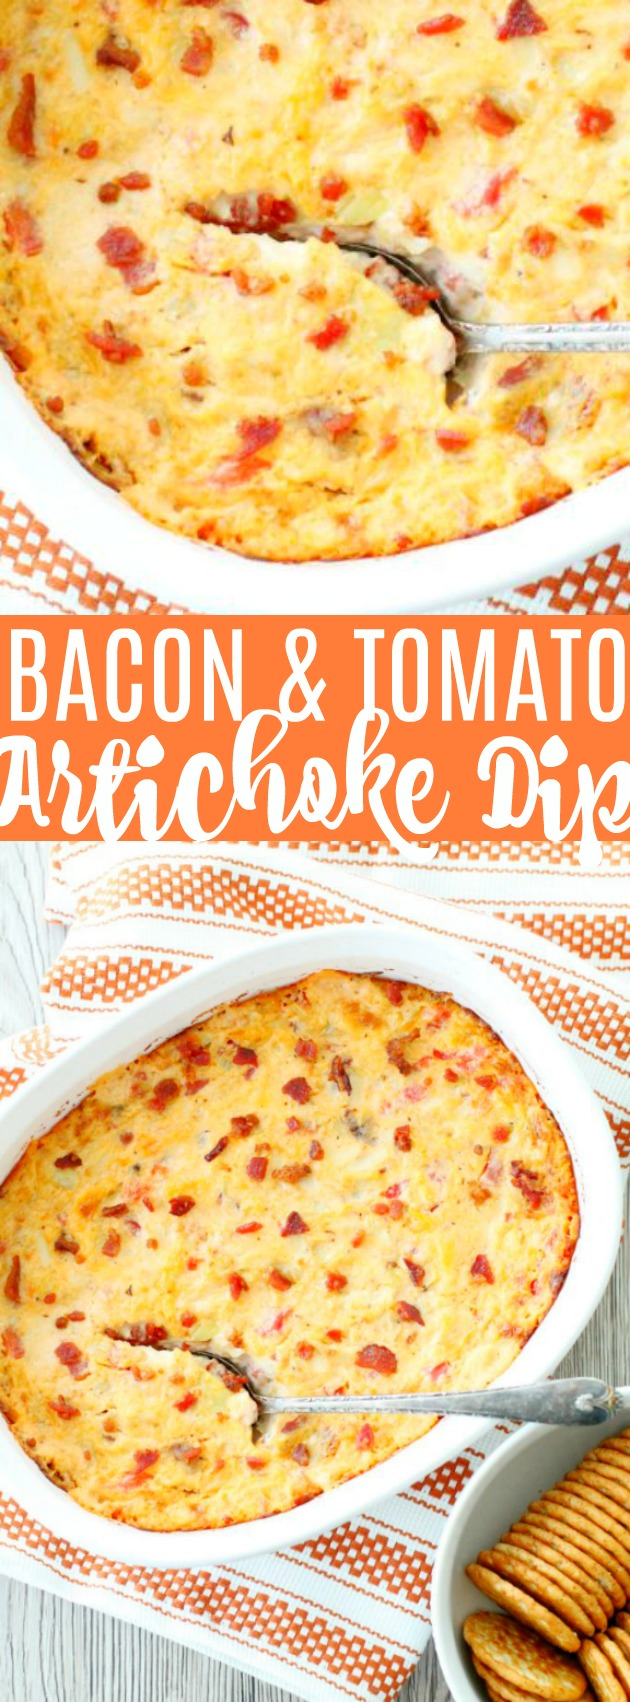 Bacon Tomato Artichoke Dip